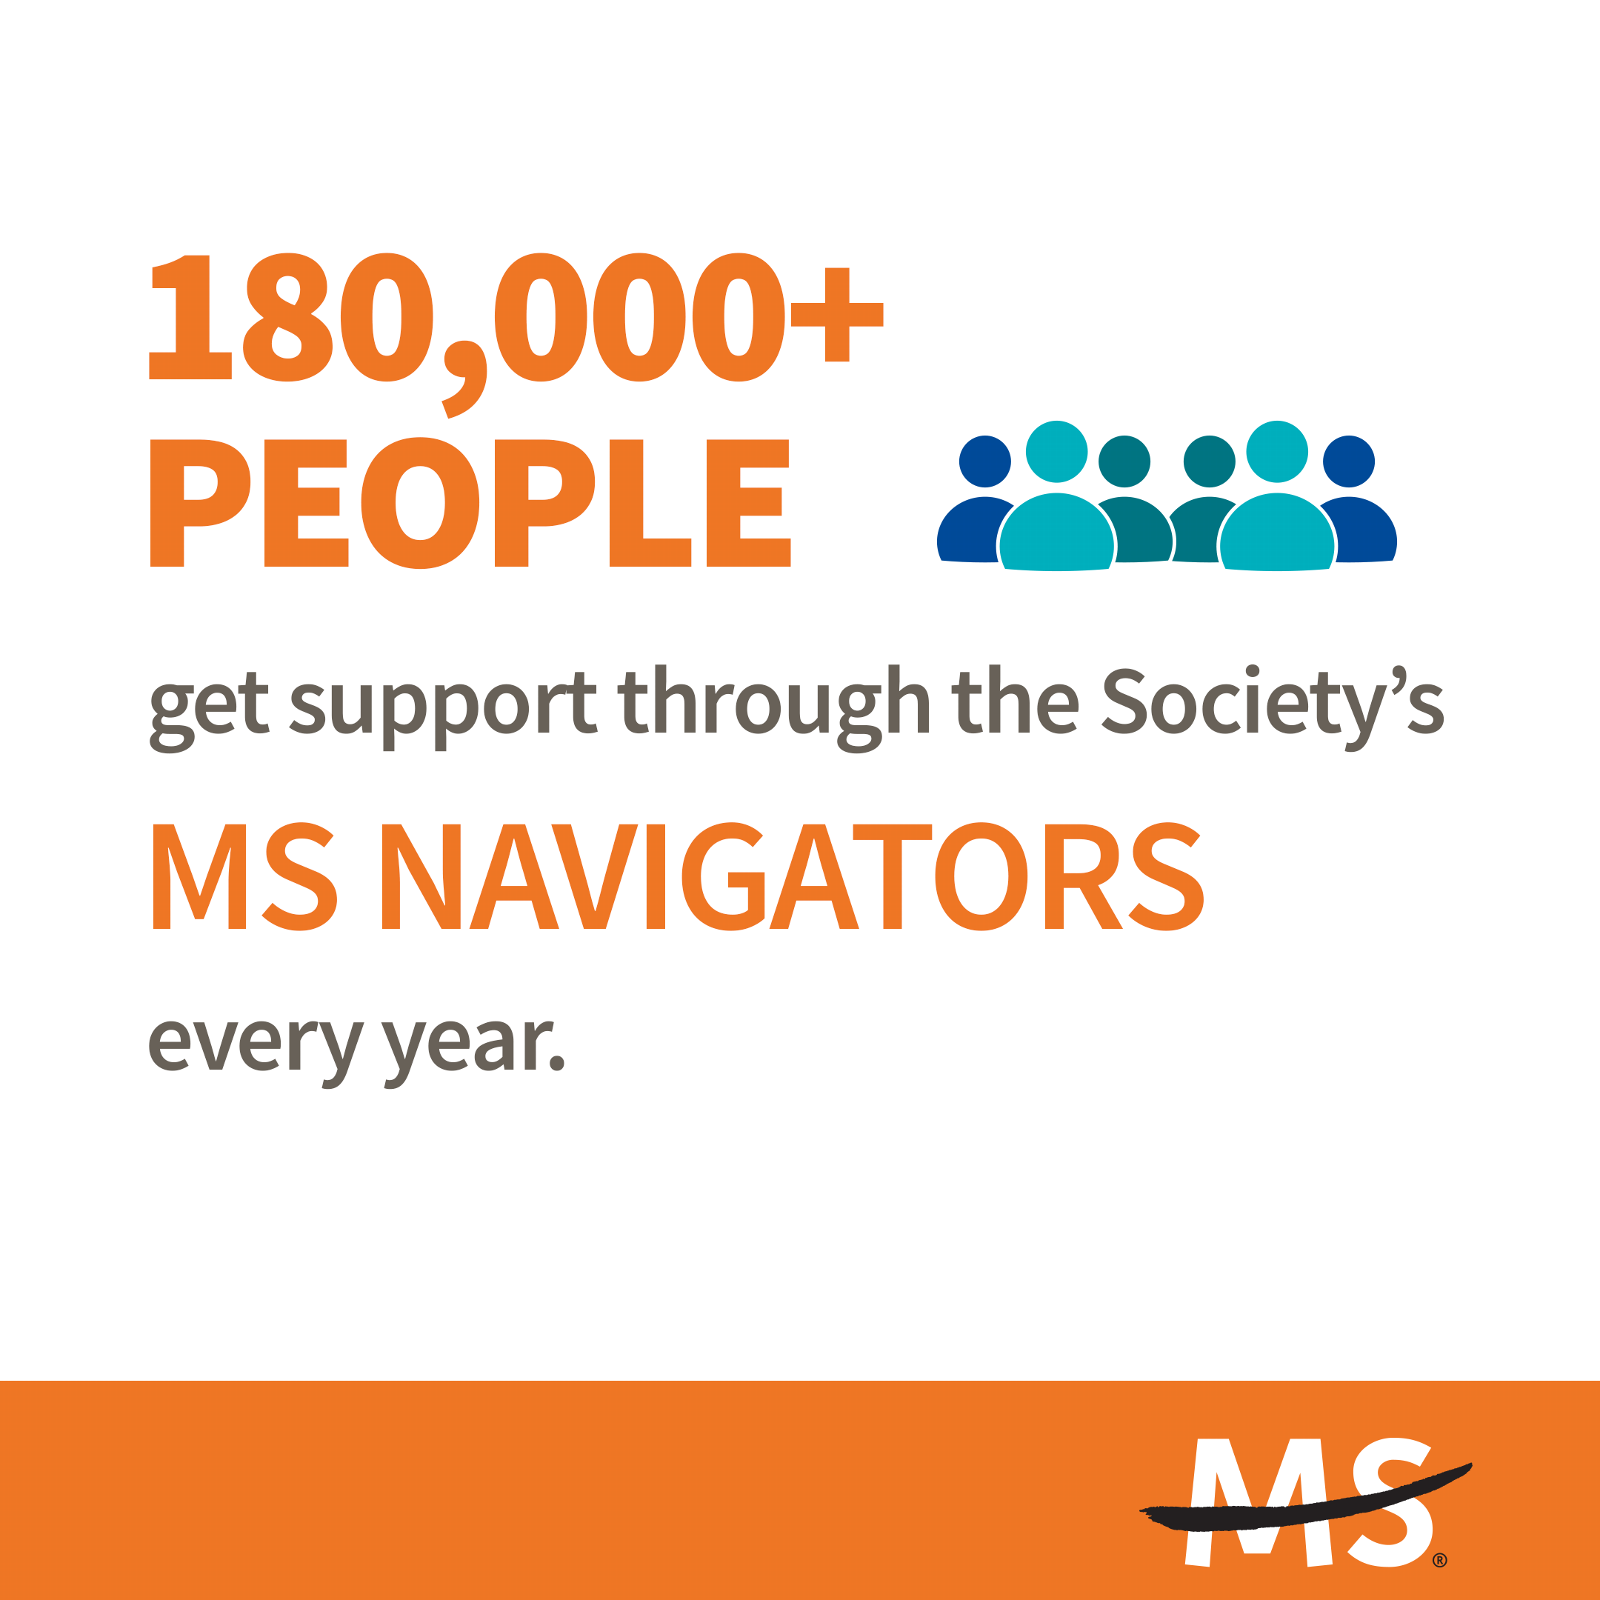 MS Navigators